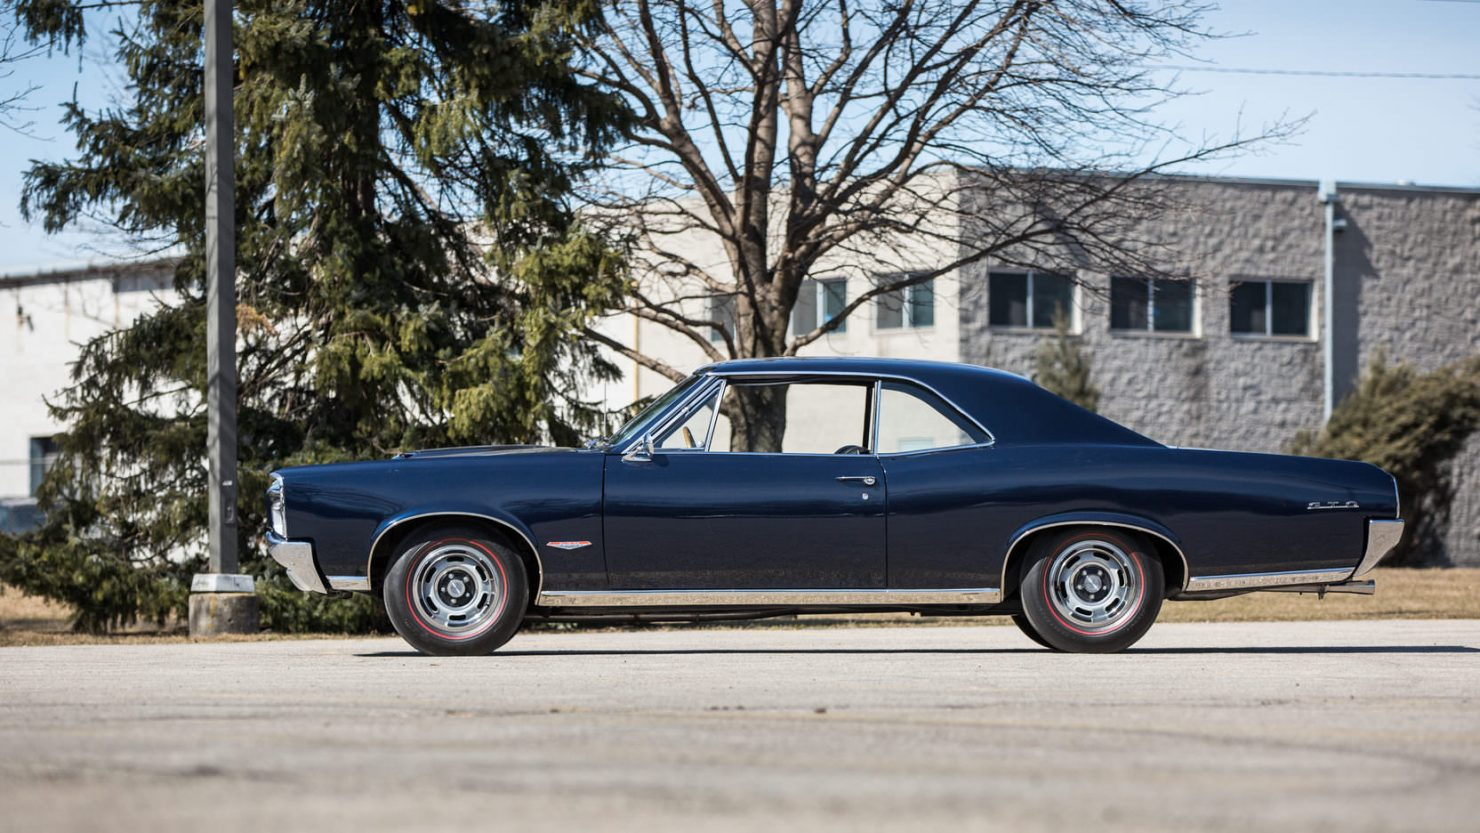 Pontiac GTO Tri Power 1 1480x833 - 1966 Pontiac GTO Tri-Power